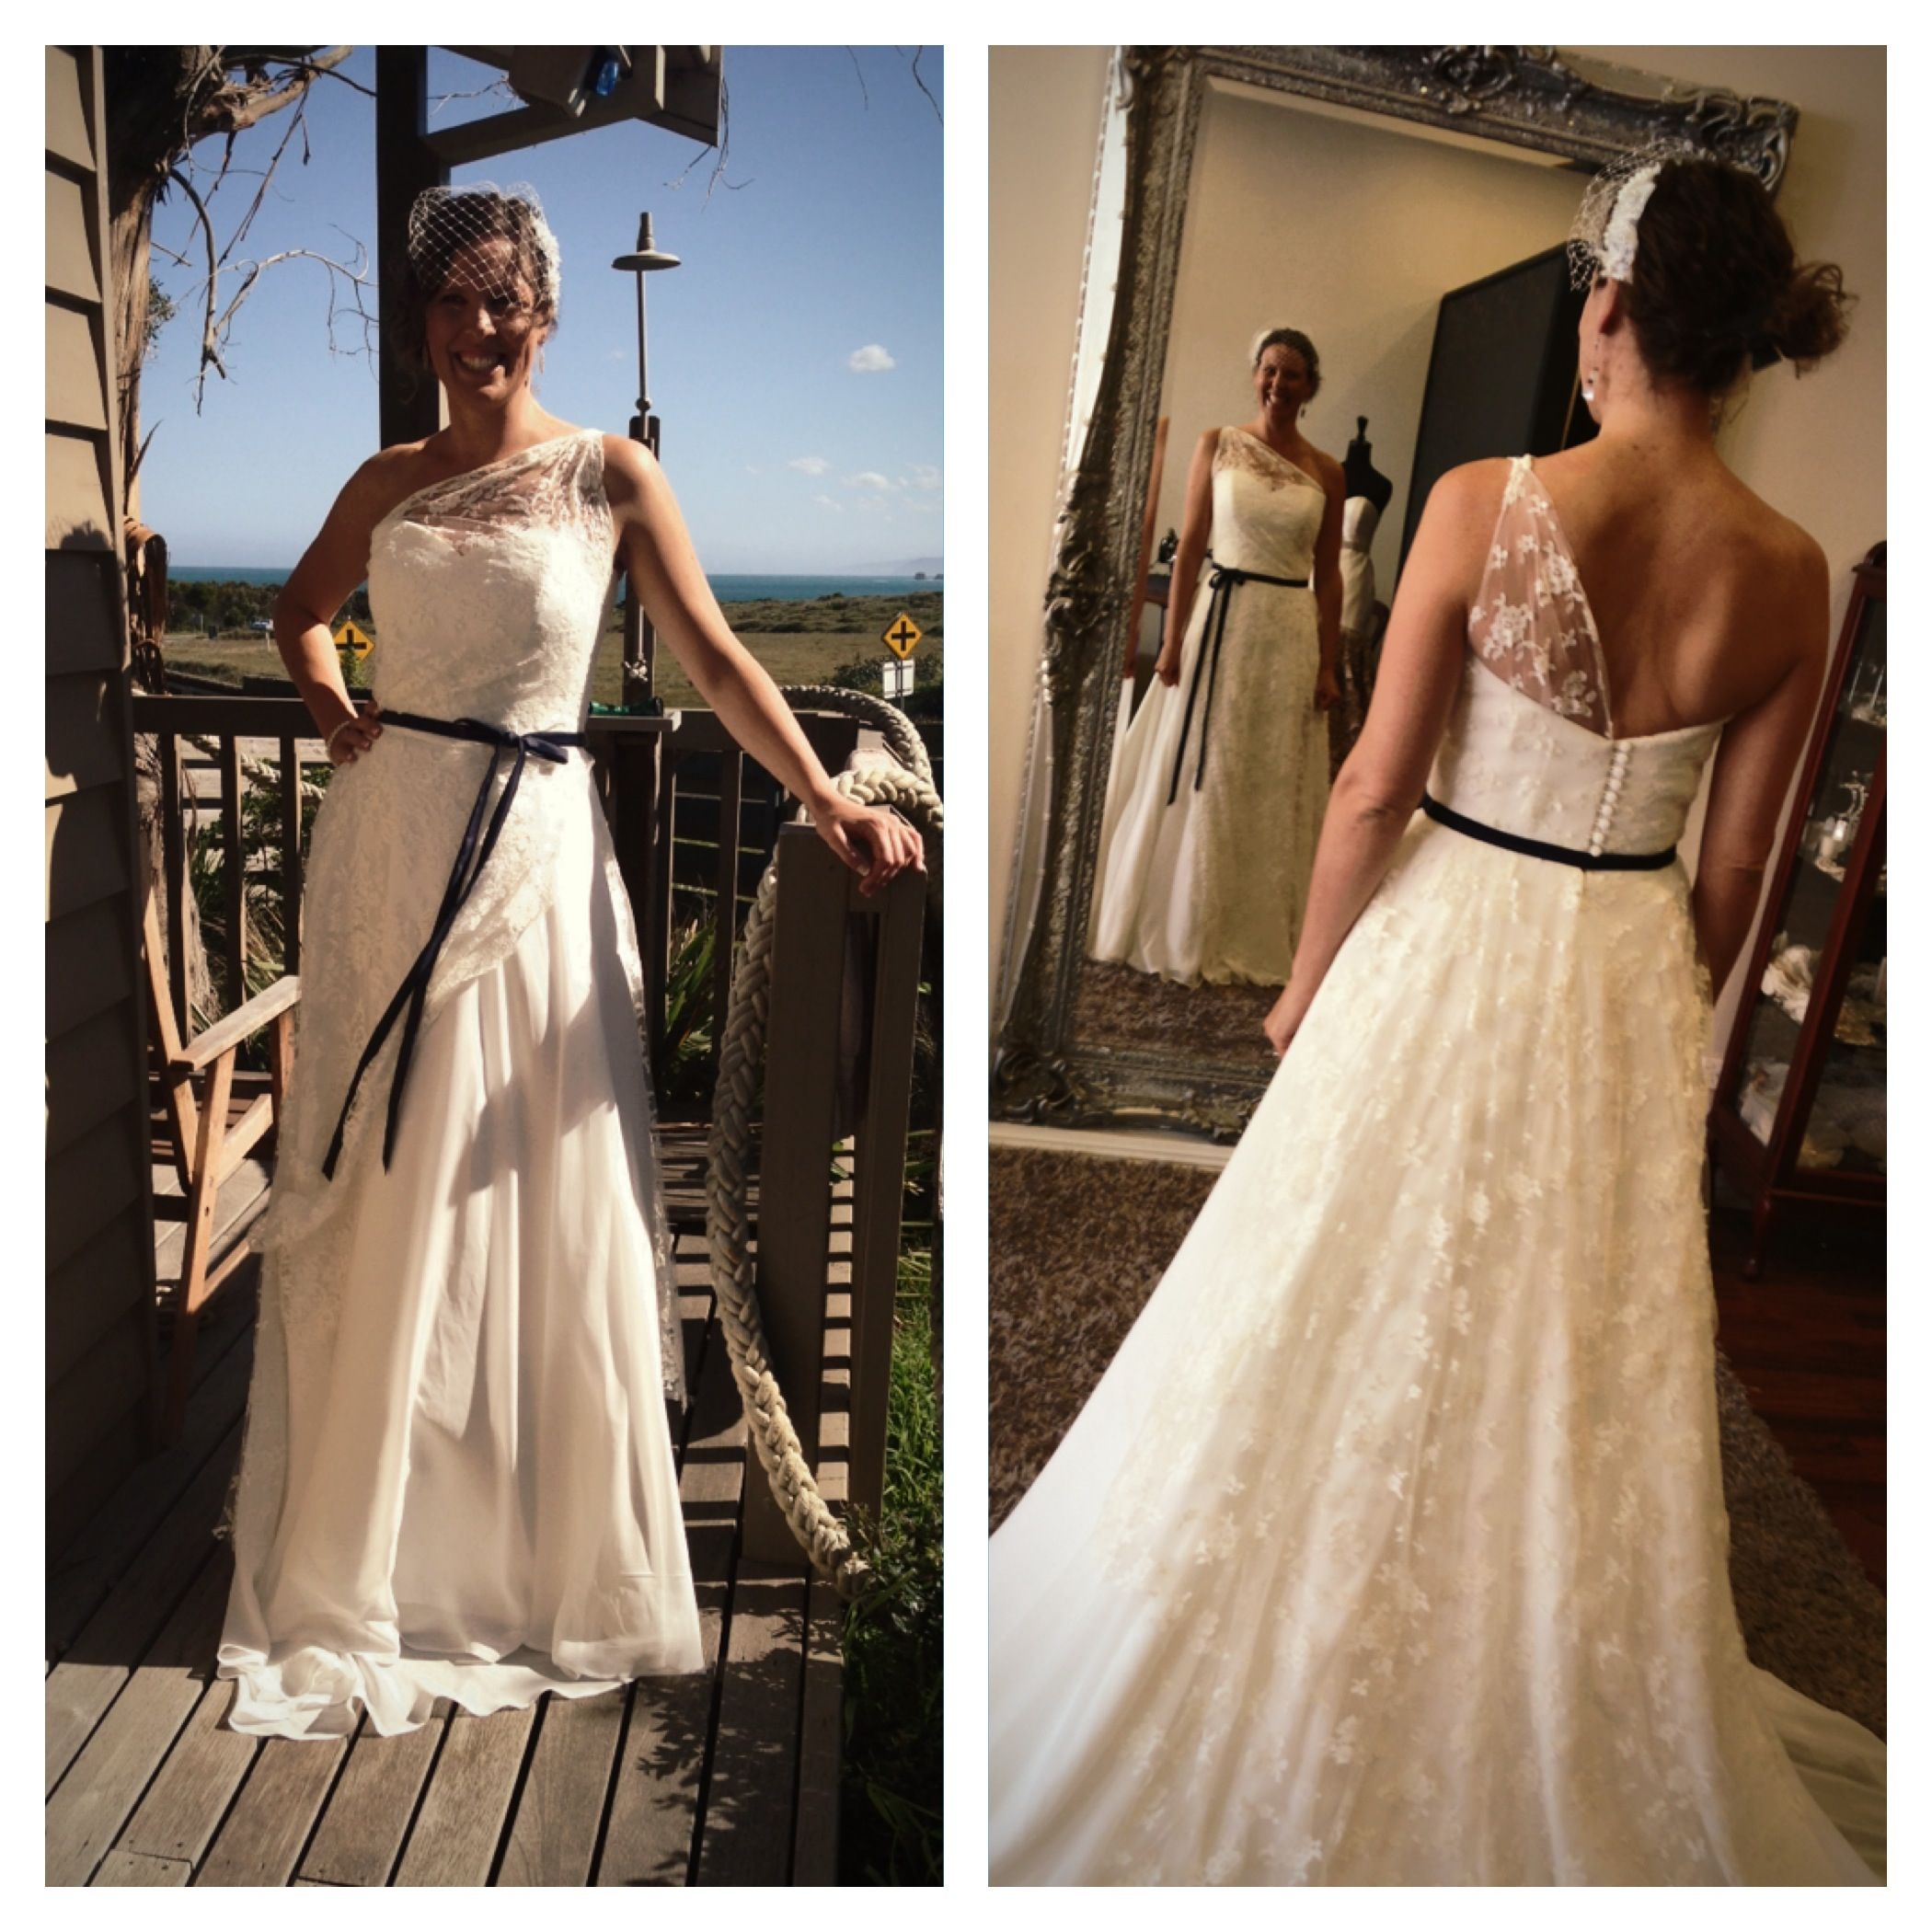 #couturebyfrancesca #bride #vintage Setting #melbourne